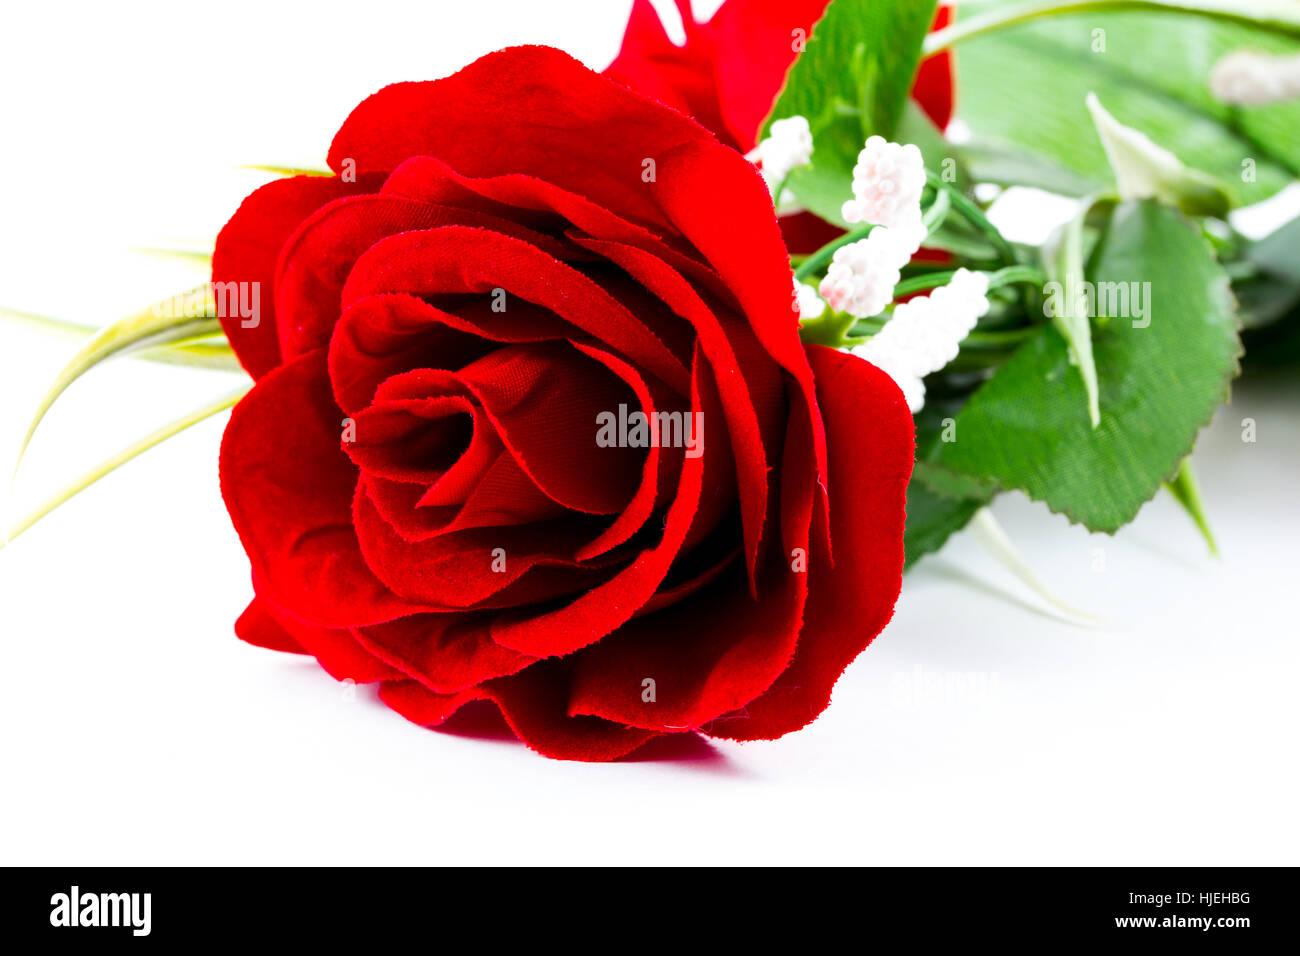 present, leaf, object, colour, flower, plant, rose, bloom